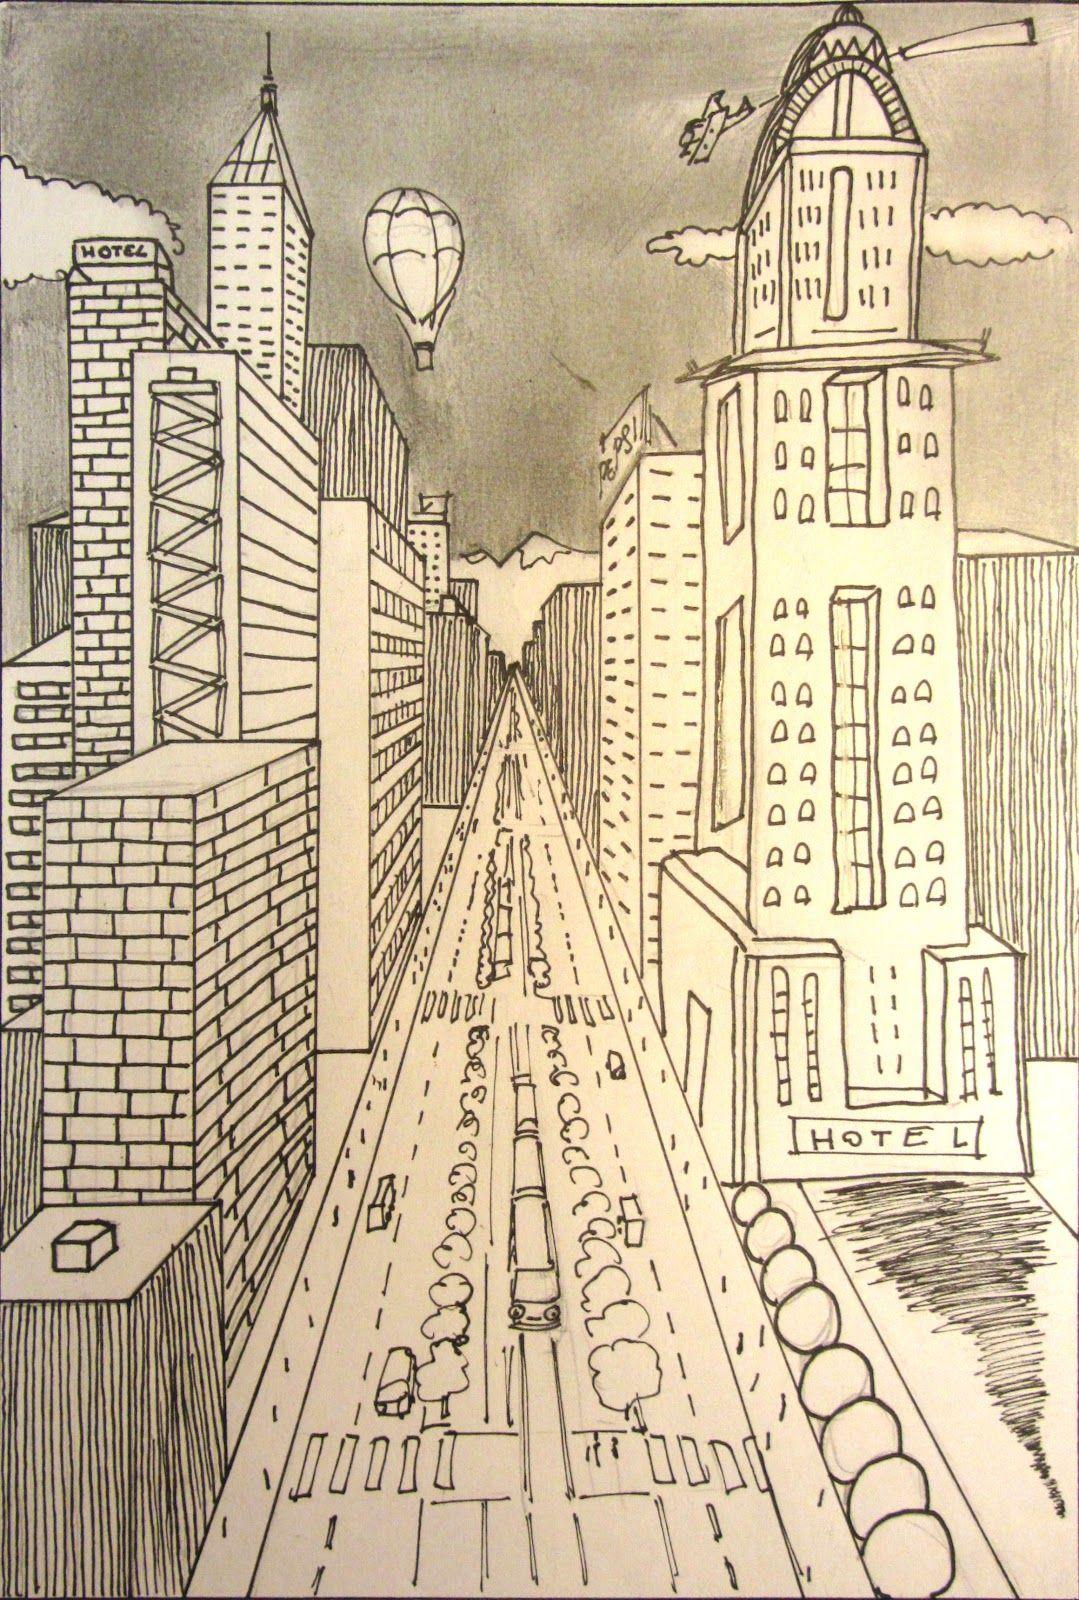 town center by Jesús | artística | Pinterest | Perspectiva, Dibujo y ...